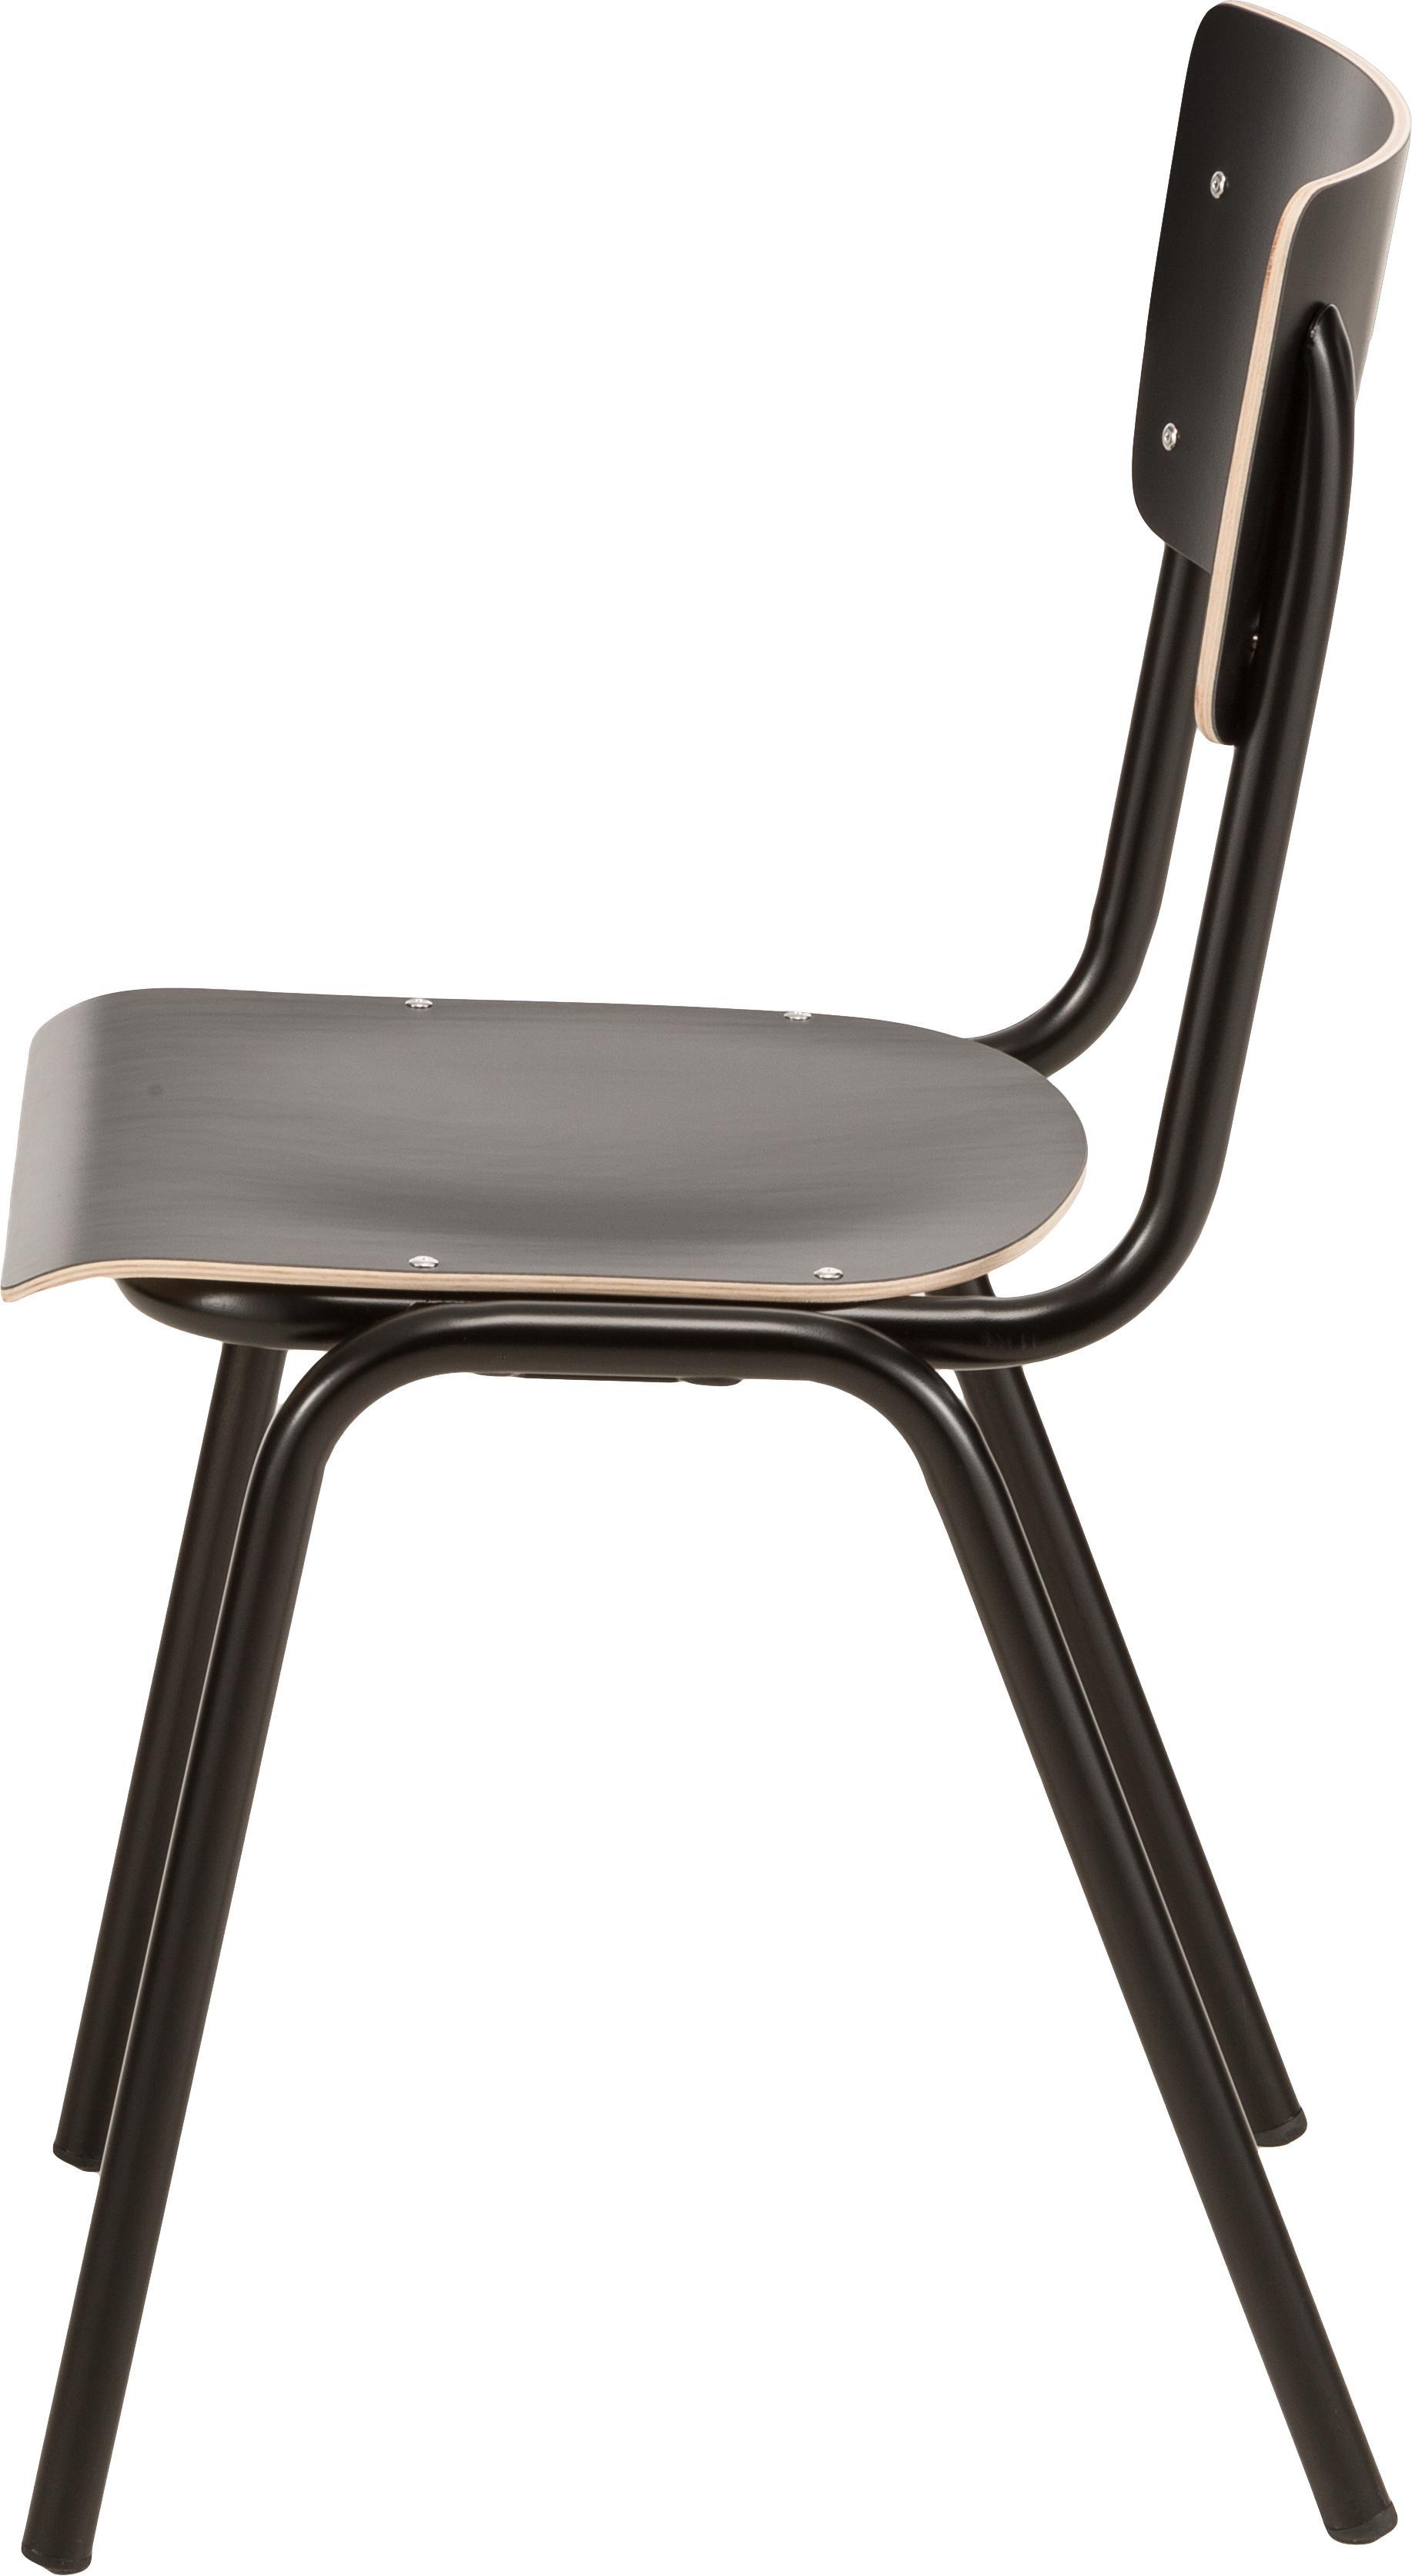 Sedia Back to School, 4 pz., Gambe: metallo verniciato a polv, Seduta: laminato, Nero, Larg. 43 x Alt. 83 cm